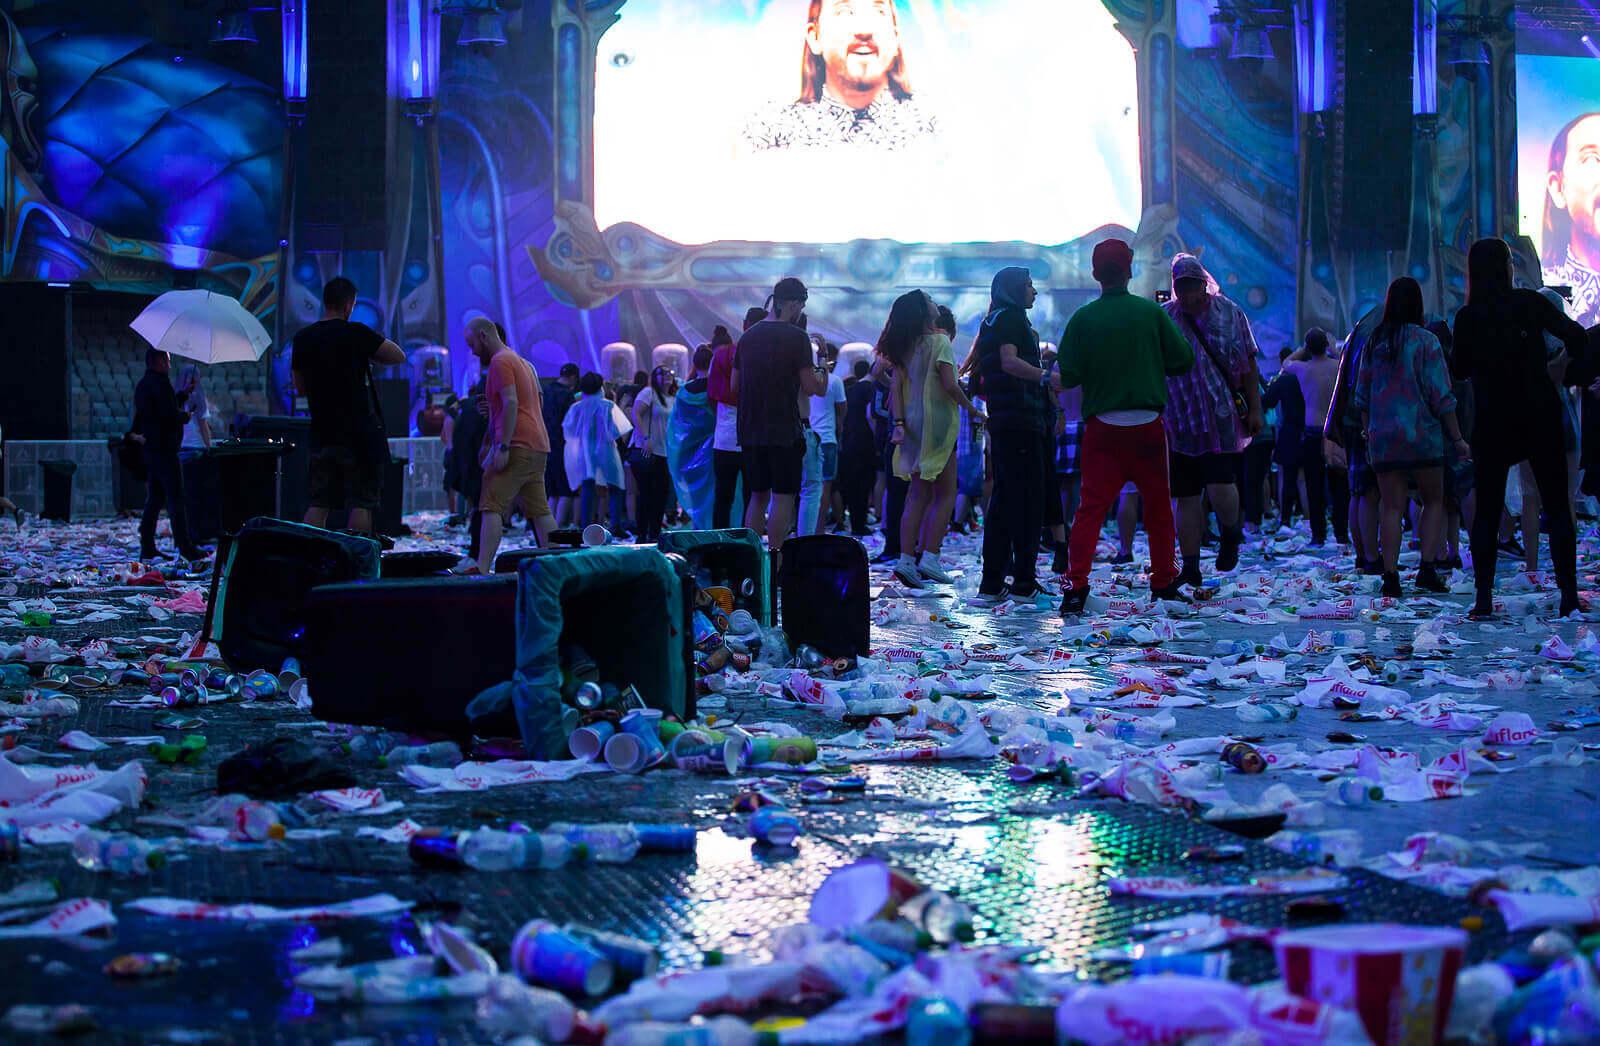 Waste on the floor at Untold Festival, Cluj-Napoca, Romania